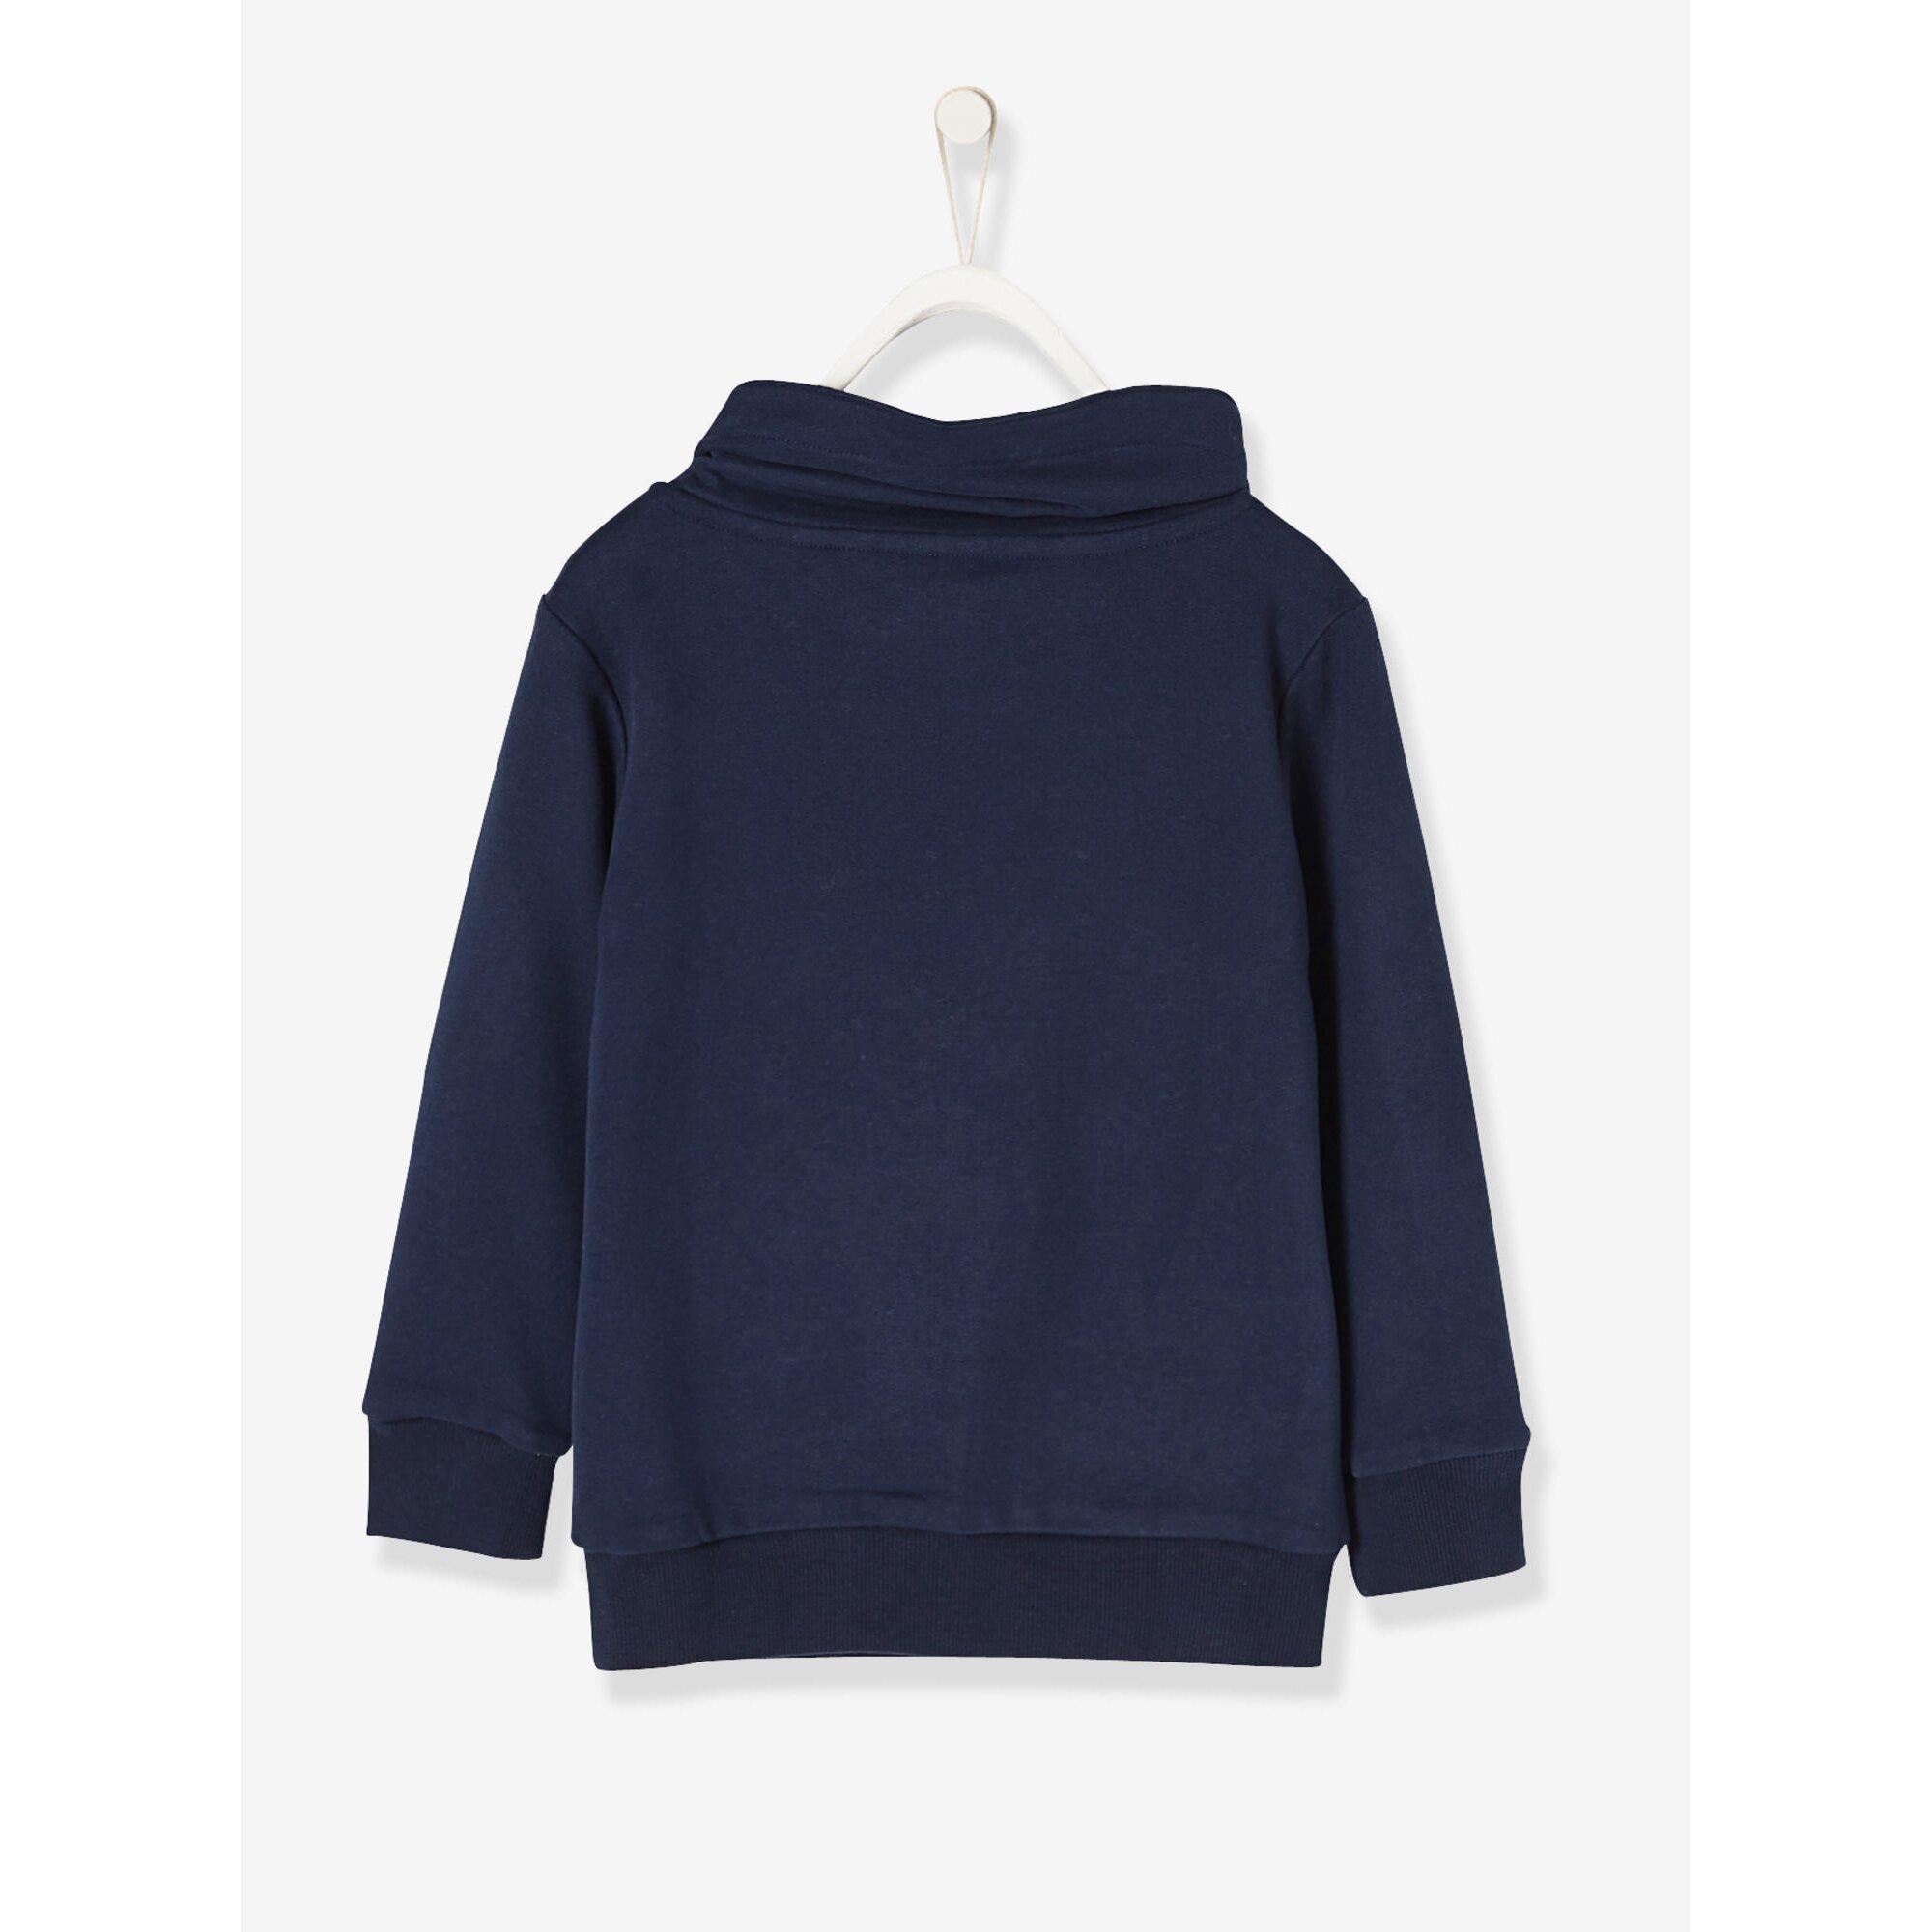 vertbaudet-jungen-sweater-uberkreuzter-stehkragen, 14.69 EUR @ babywalz-de